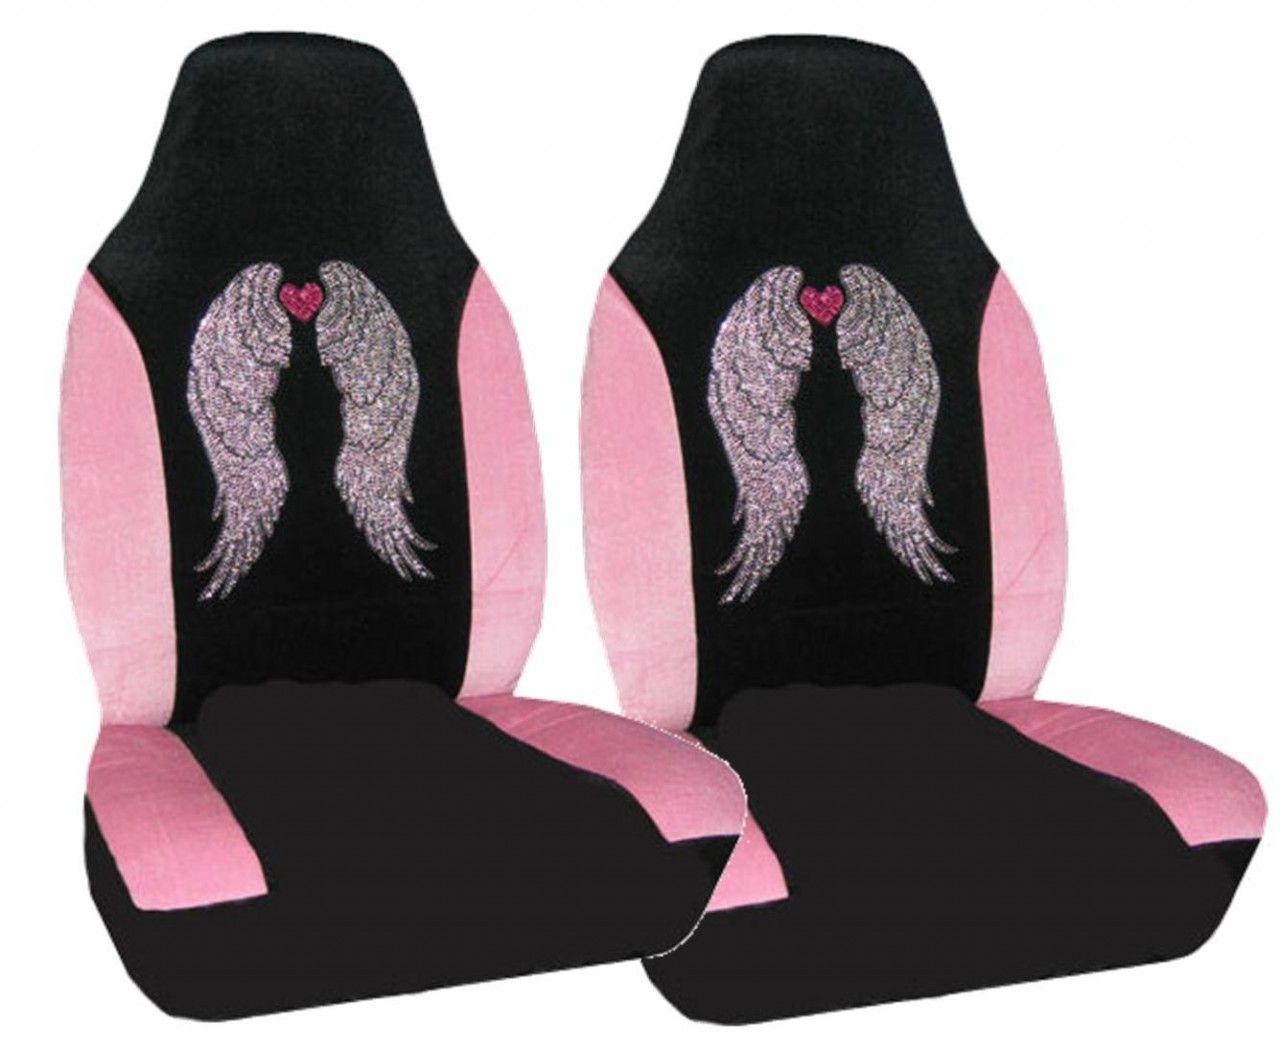 Girly Angel Wing Rhinestone Car Seat Cover